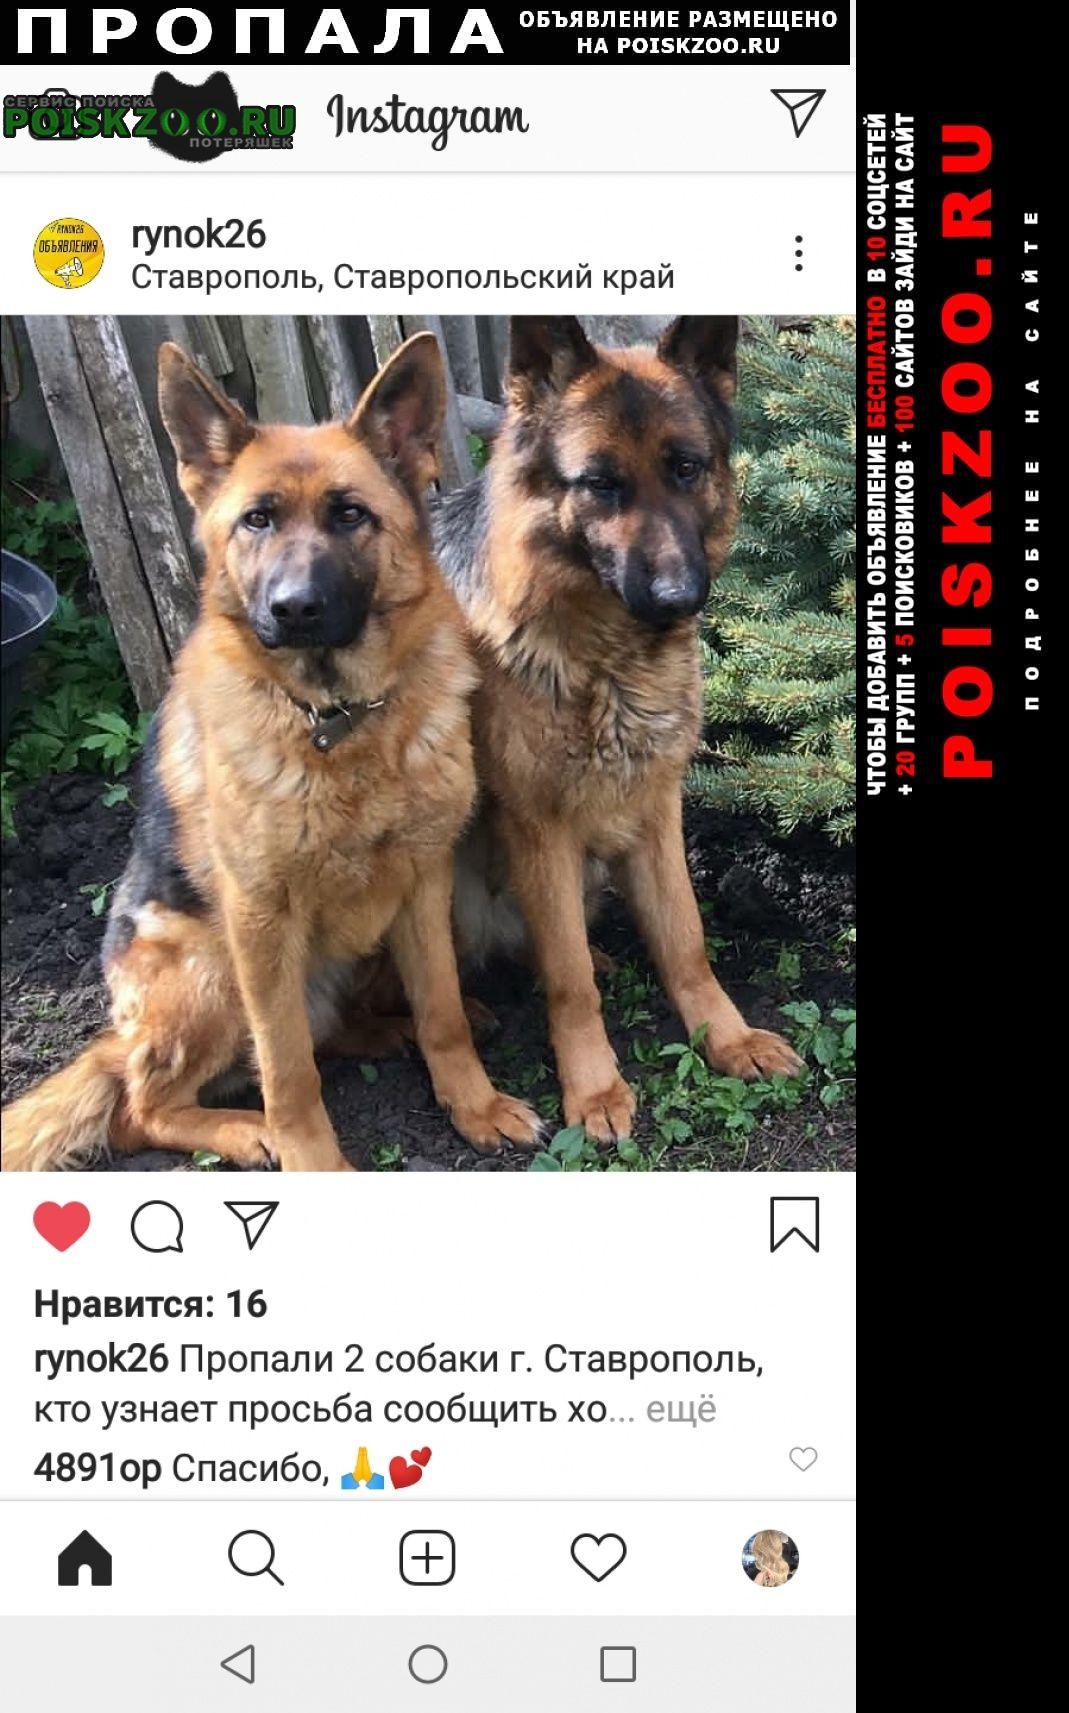 Пропала собака срочно срочно срочно Ставрополь